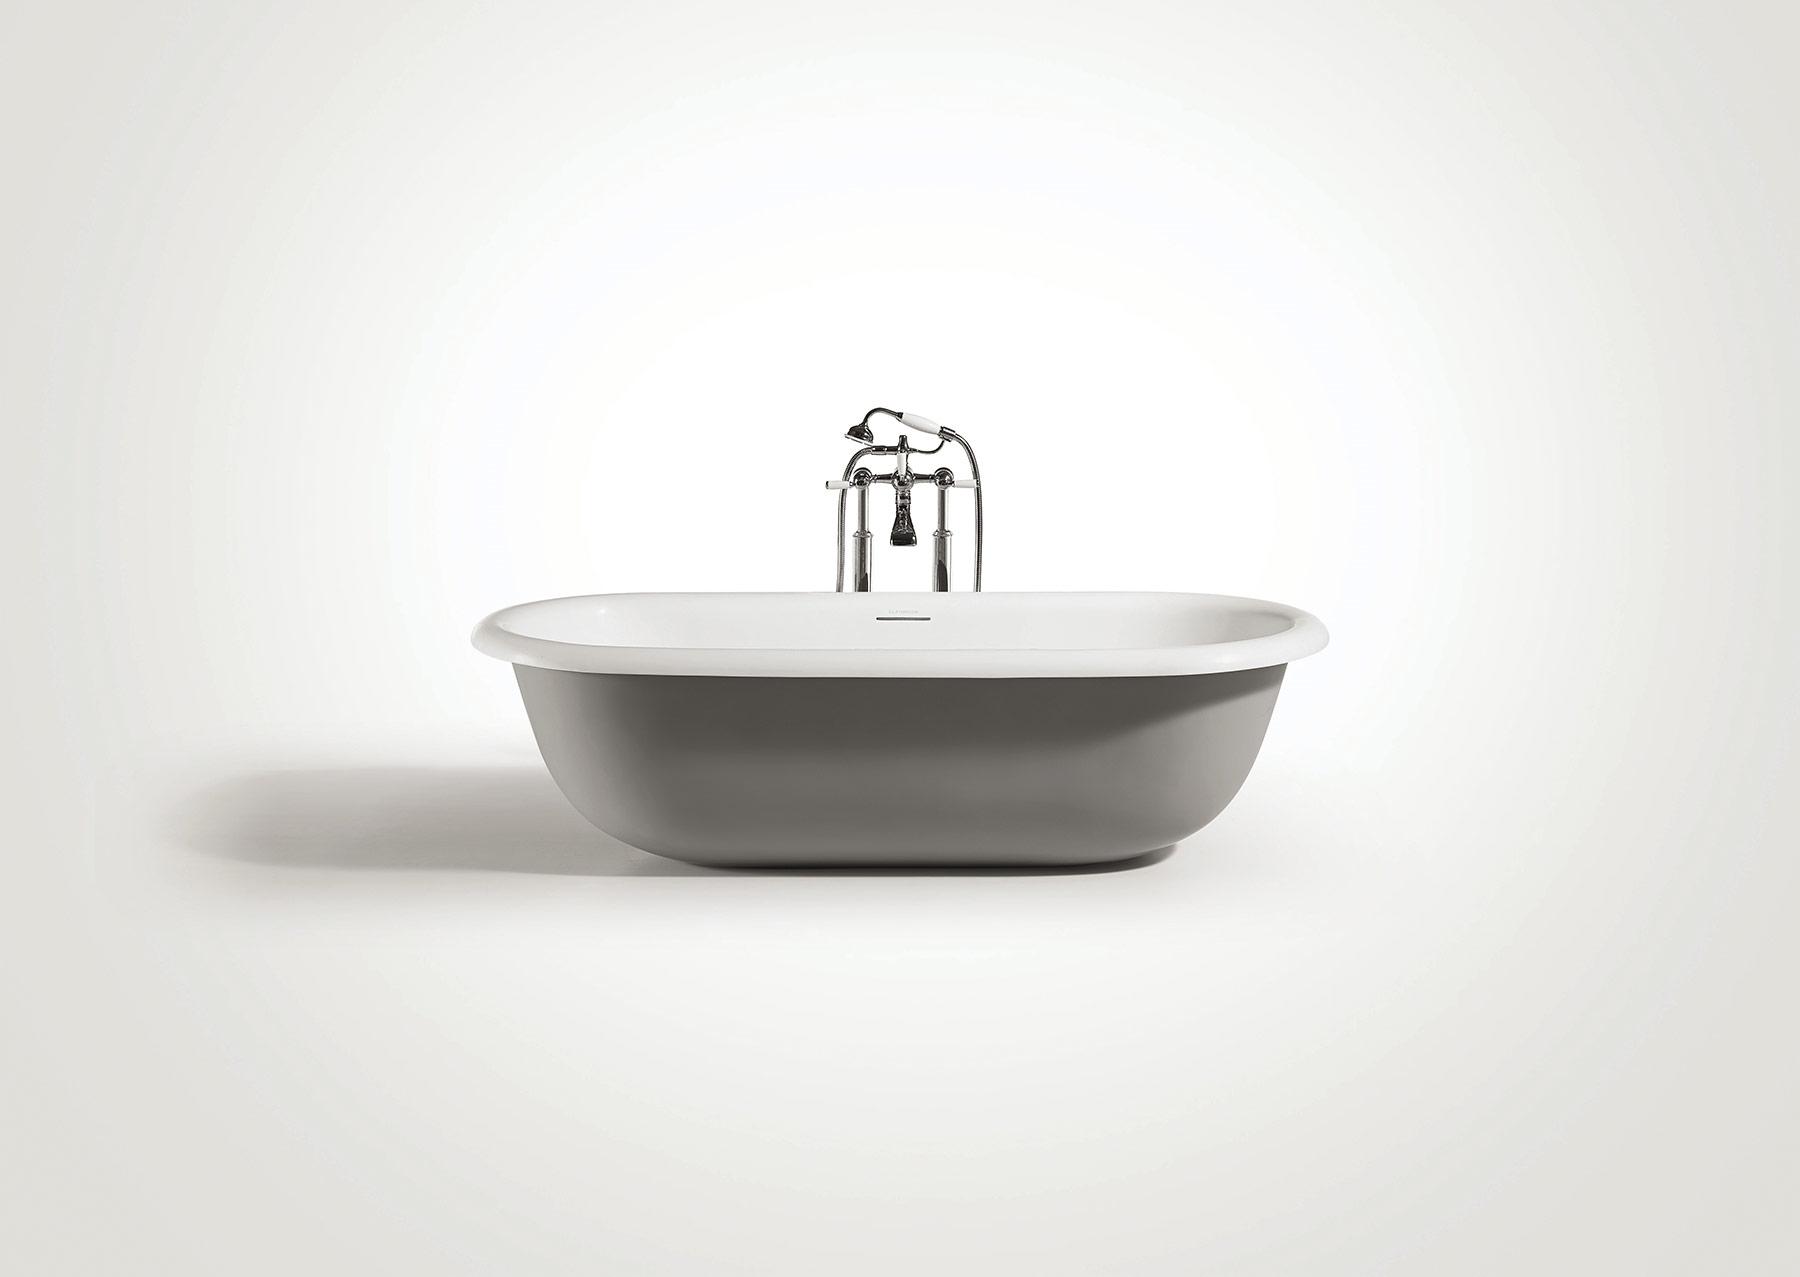 Modern Evolve Freestanding Bathtub